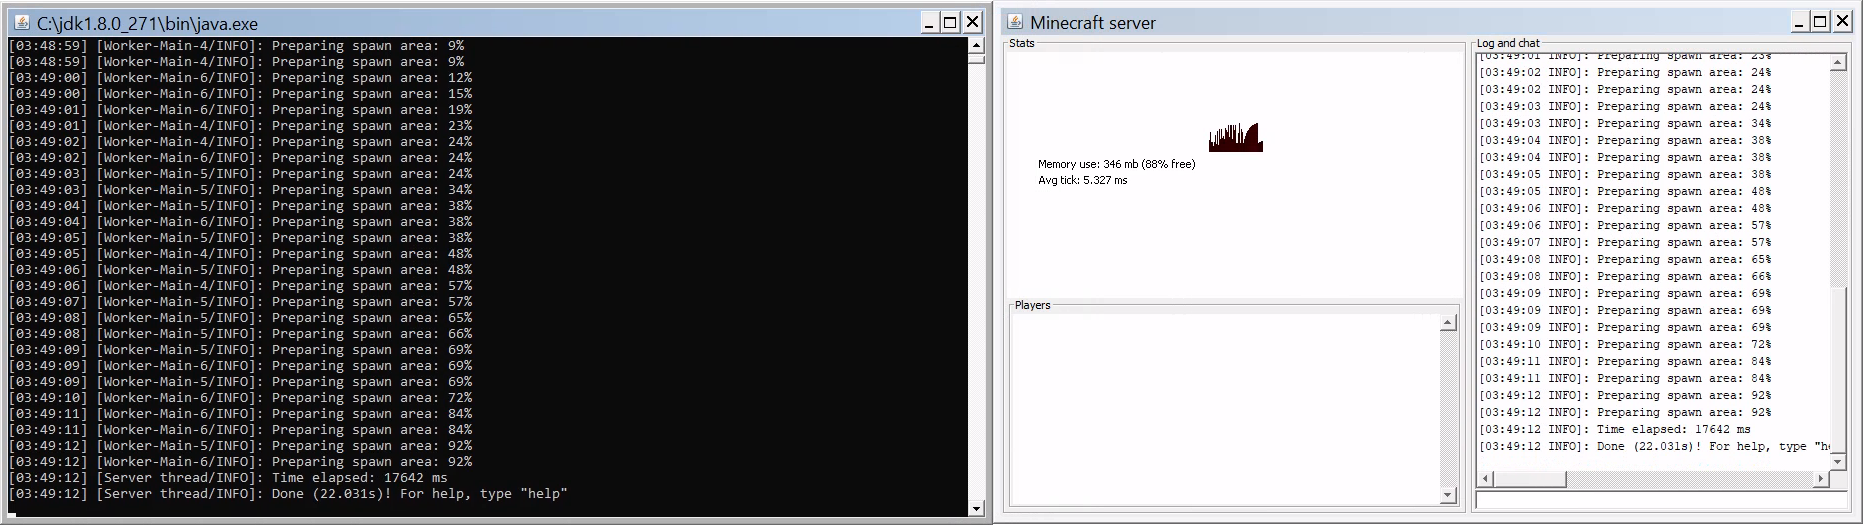 Minecraft dedicated server messages window